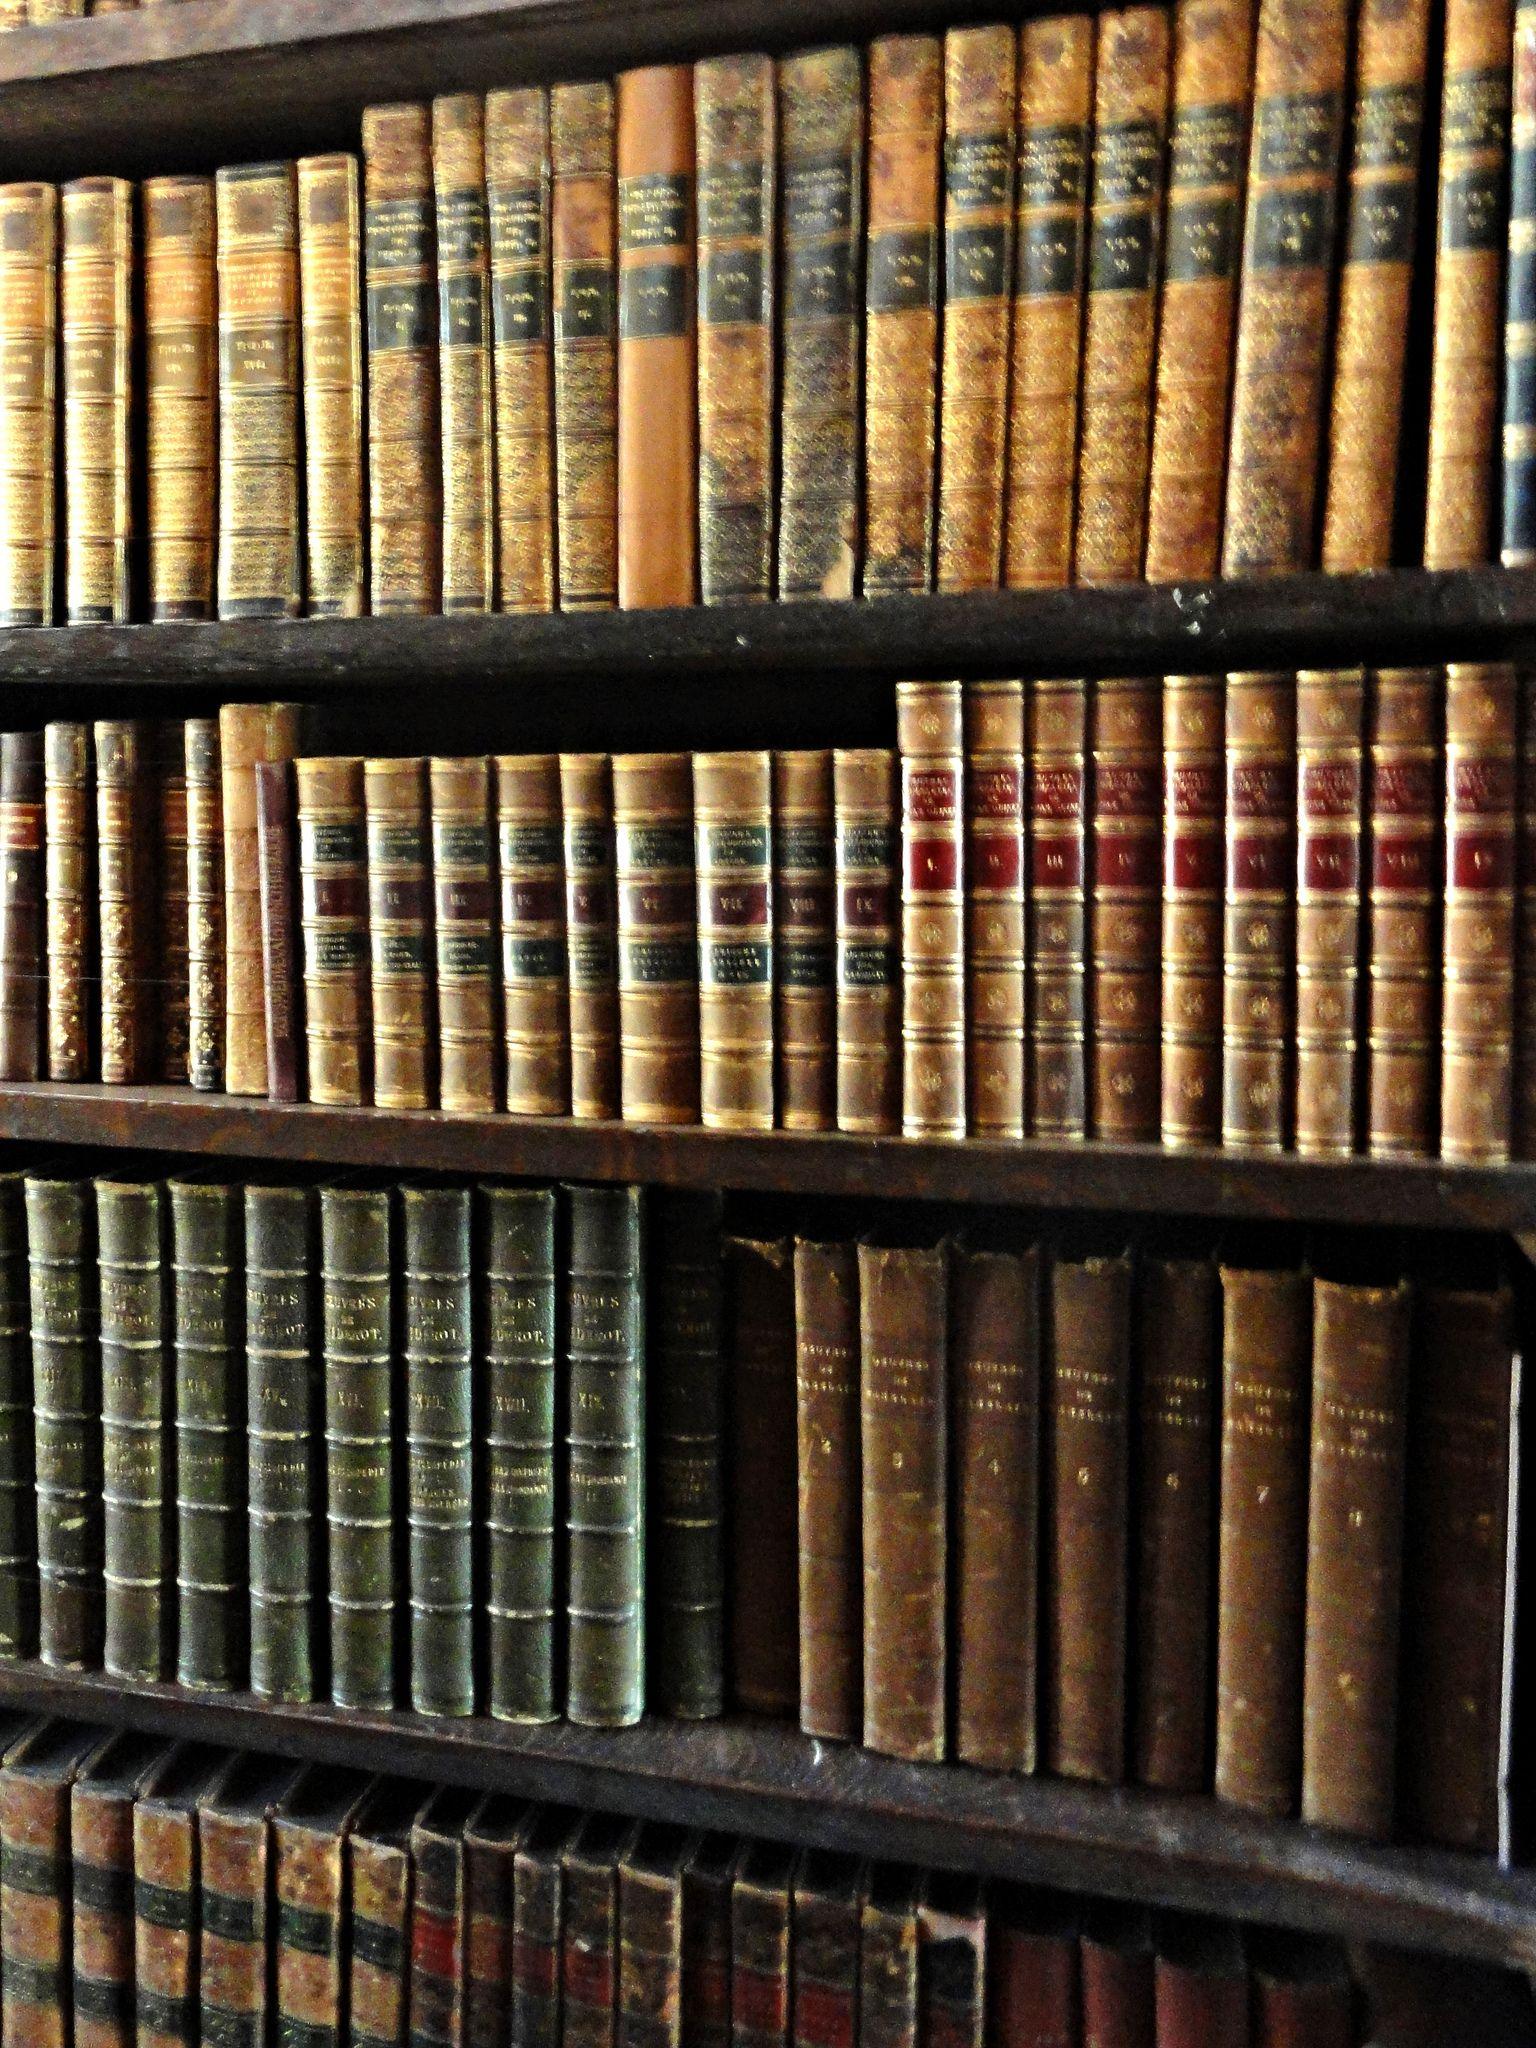 https://flic.kr/p/t9ttaZ | Merton College, Mob Library | Oxford